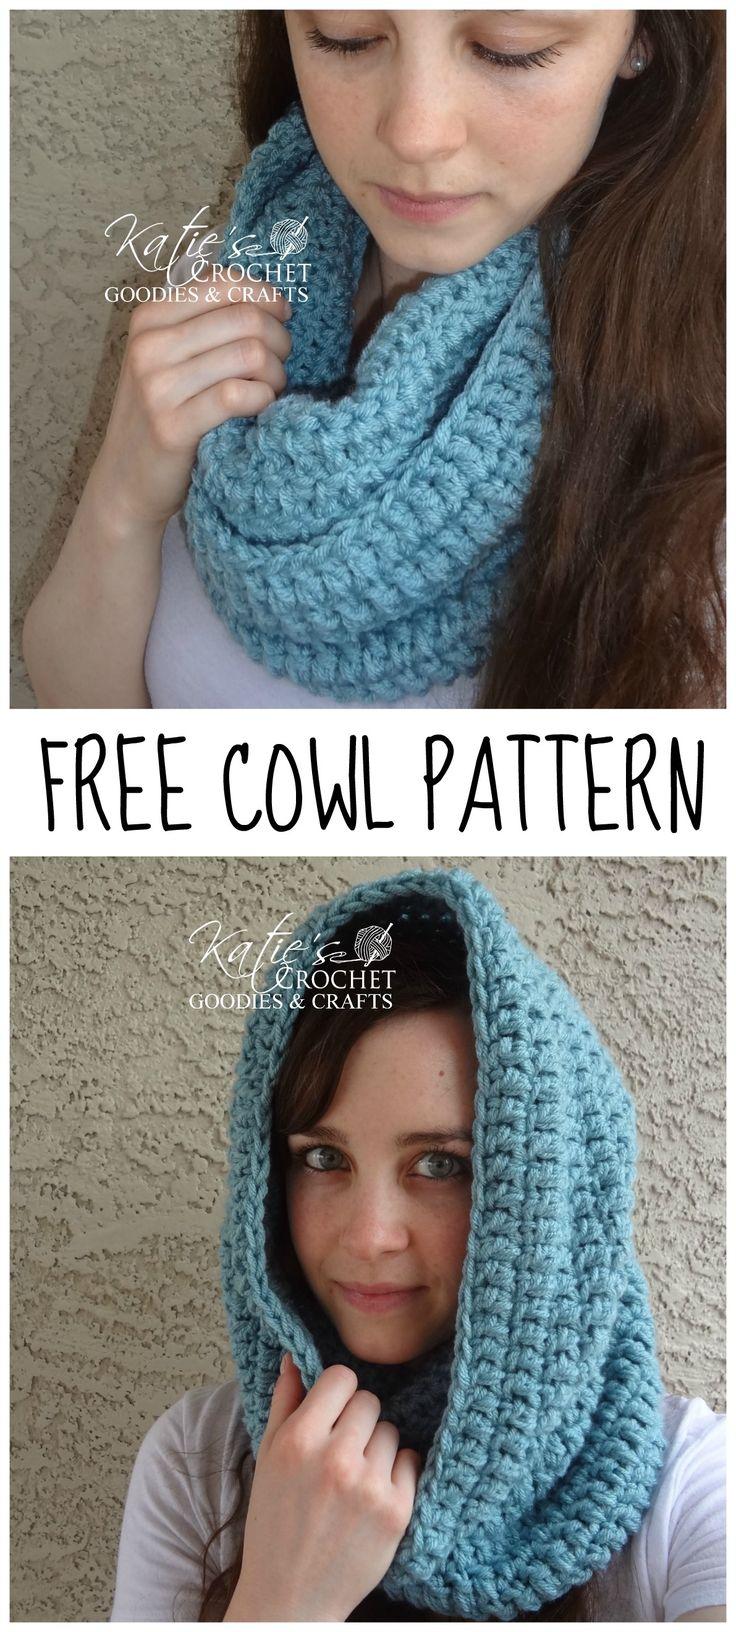 Free Easy Crochet Cowl Pattern by Katie's Crochet Goodies